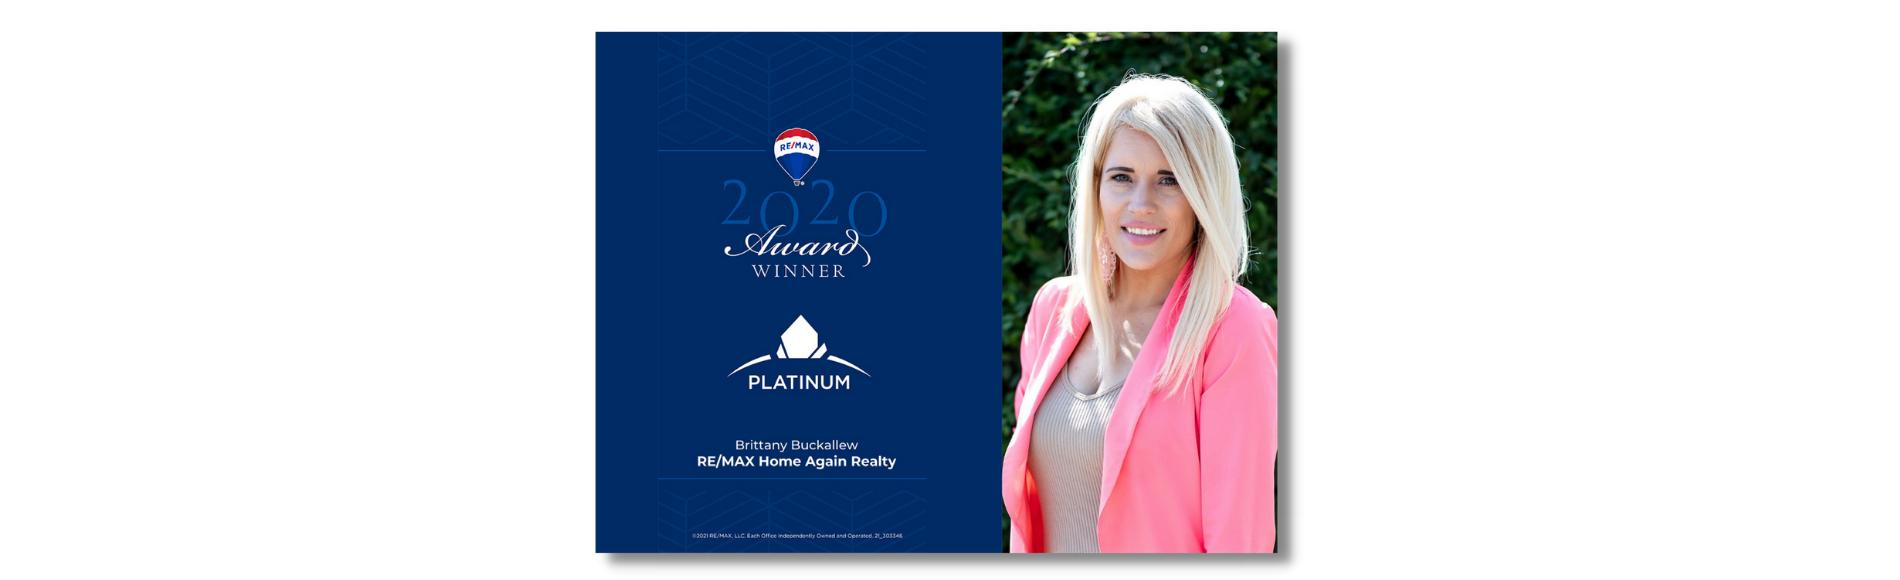 Brittany Buckallew Montana Realtor Award